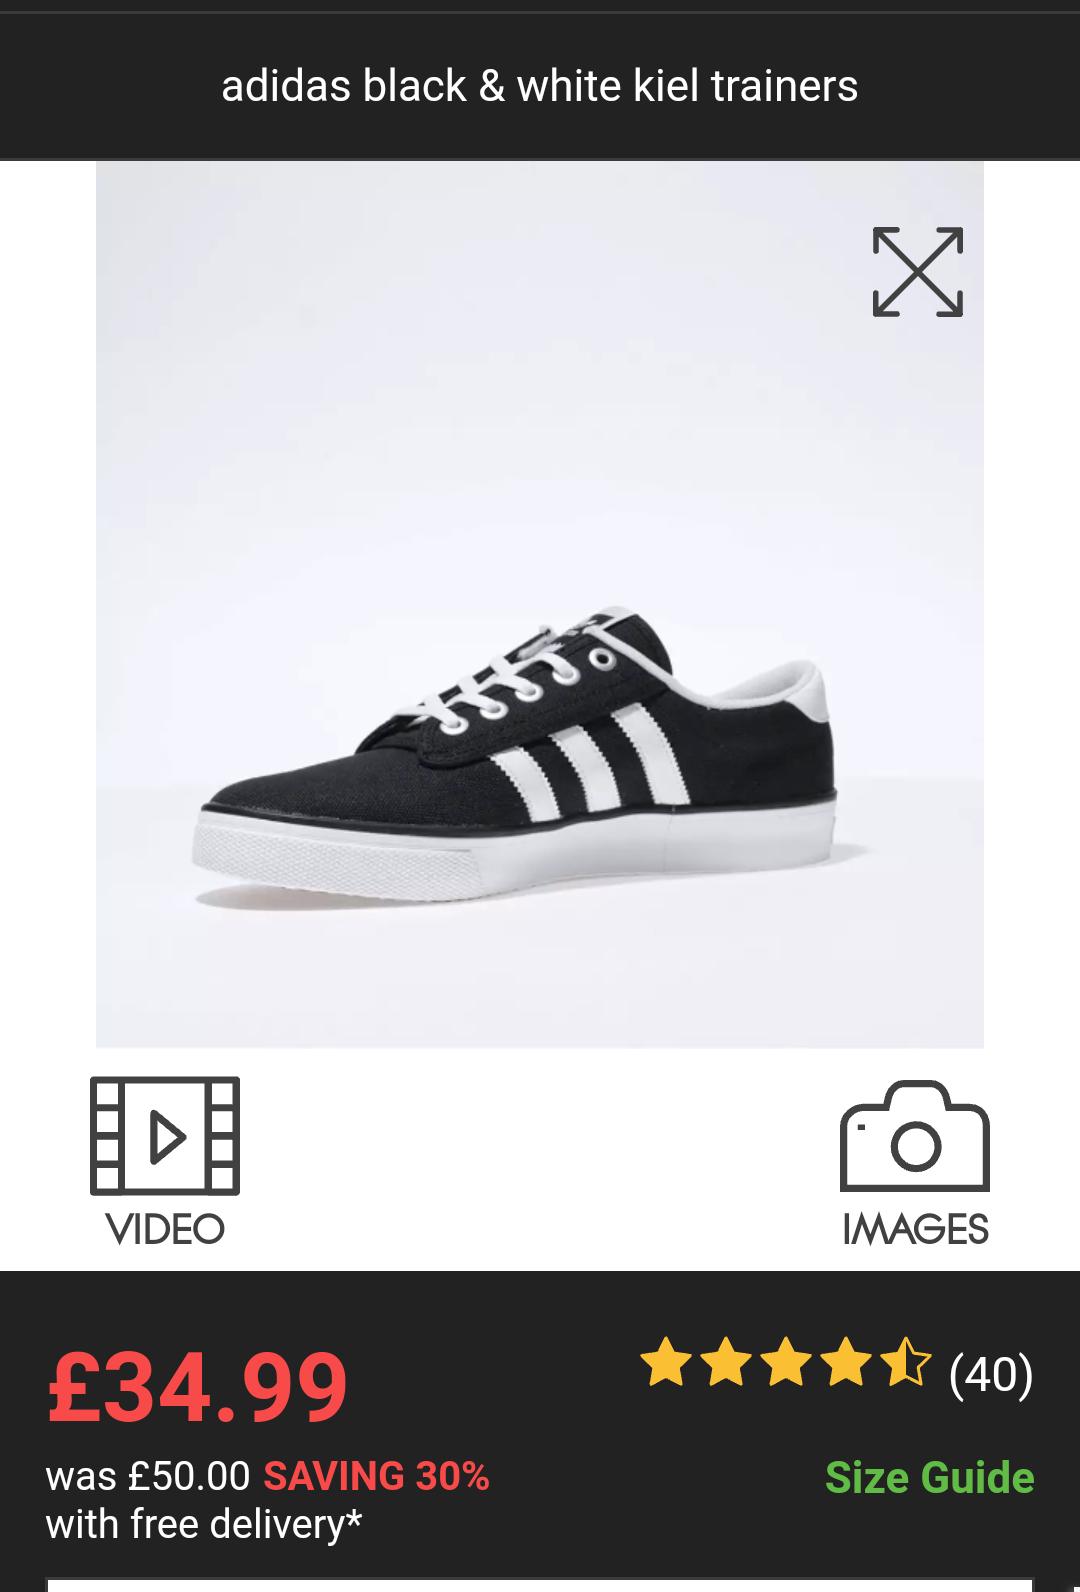 Men's Adidas black & white keil trainers - £34.99 @ Schuh